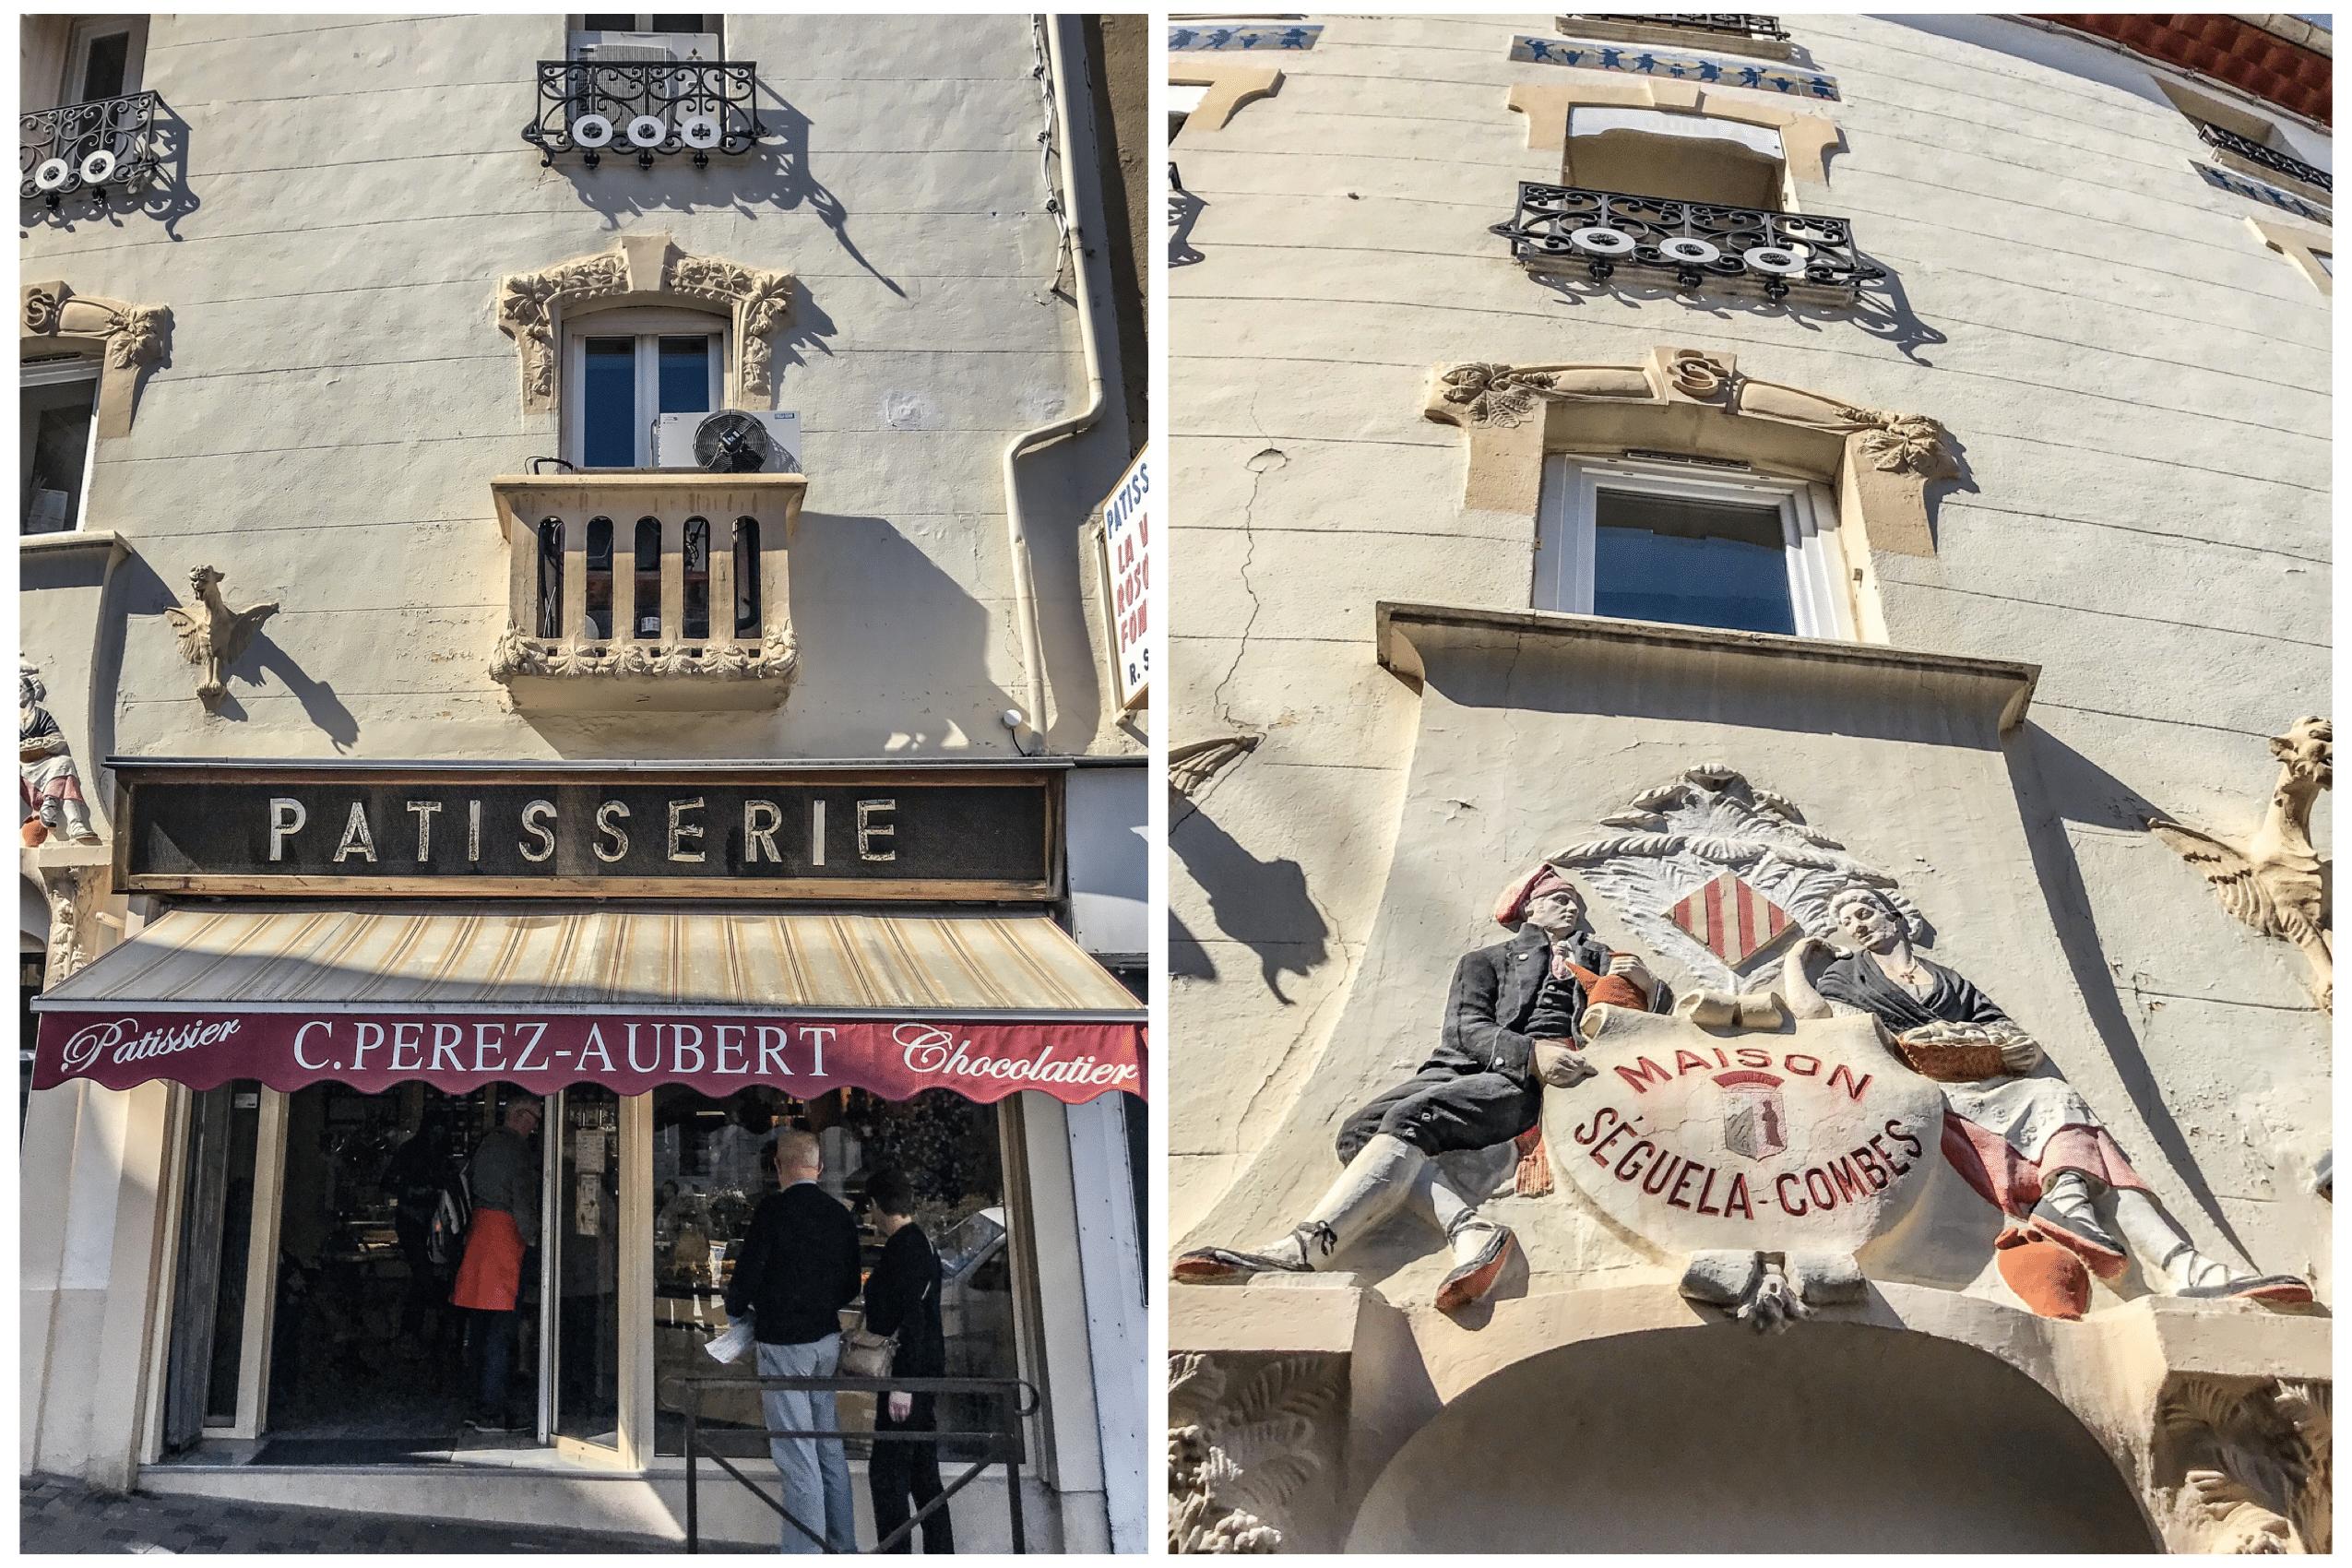 La pâtisserie Perez-Aubert